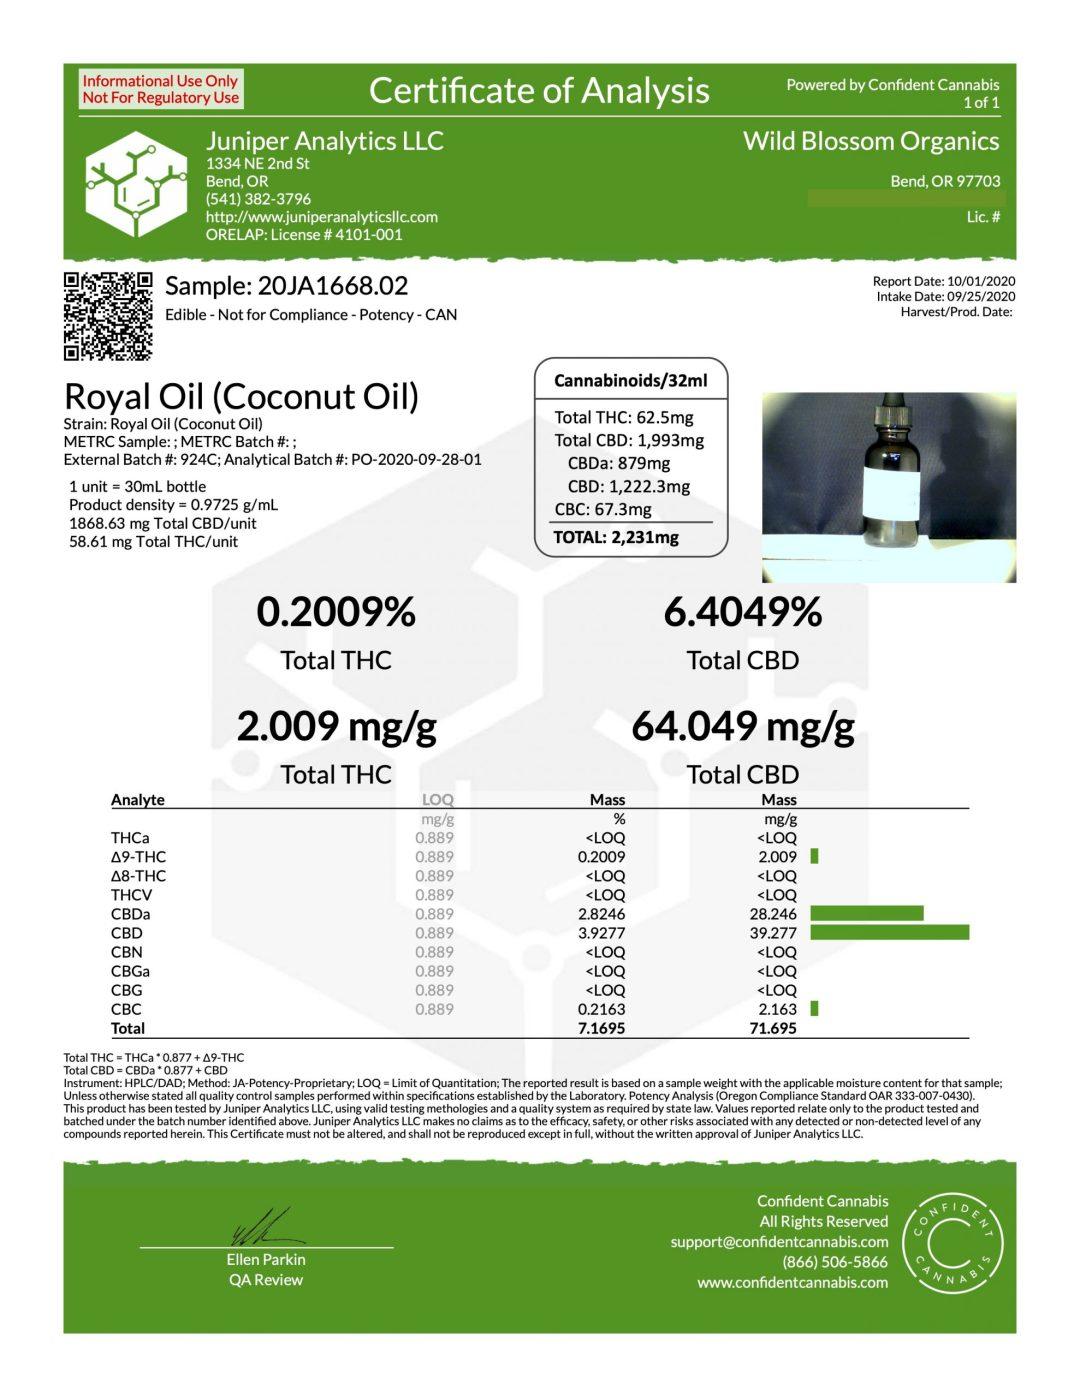 Royal Oil CBD oil - 2,000mg CBD